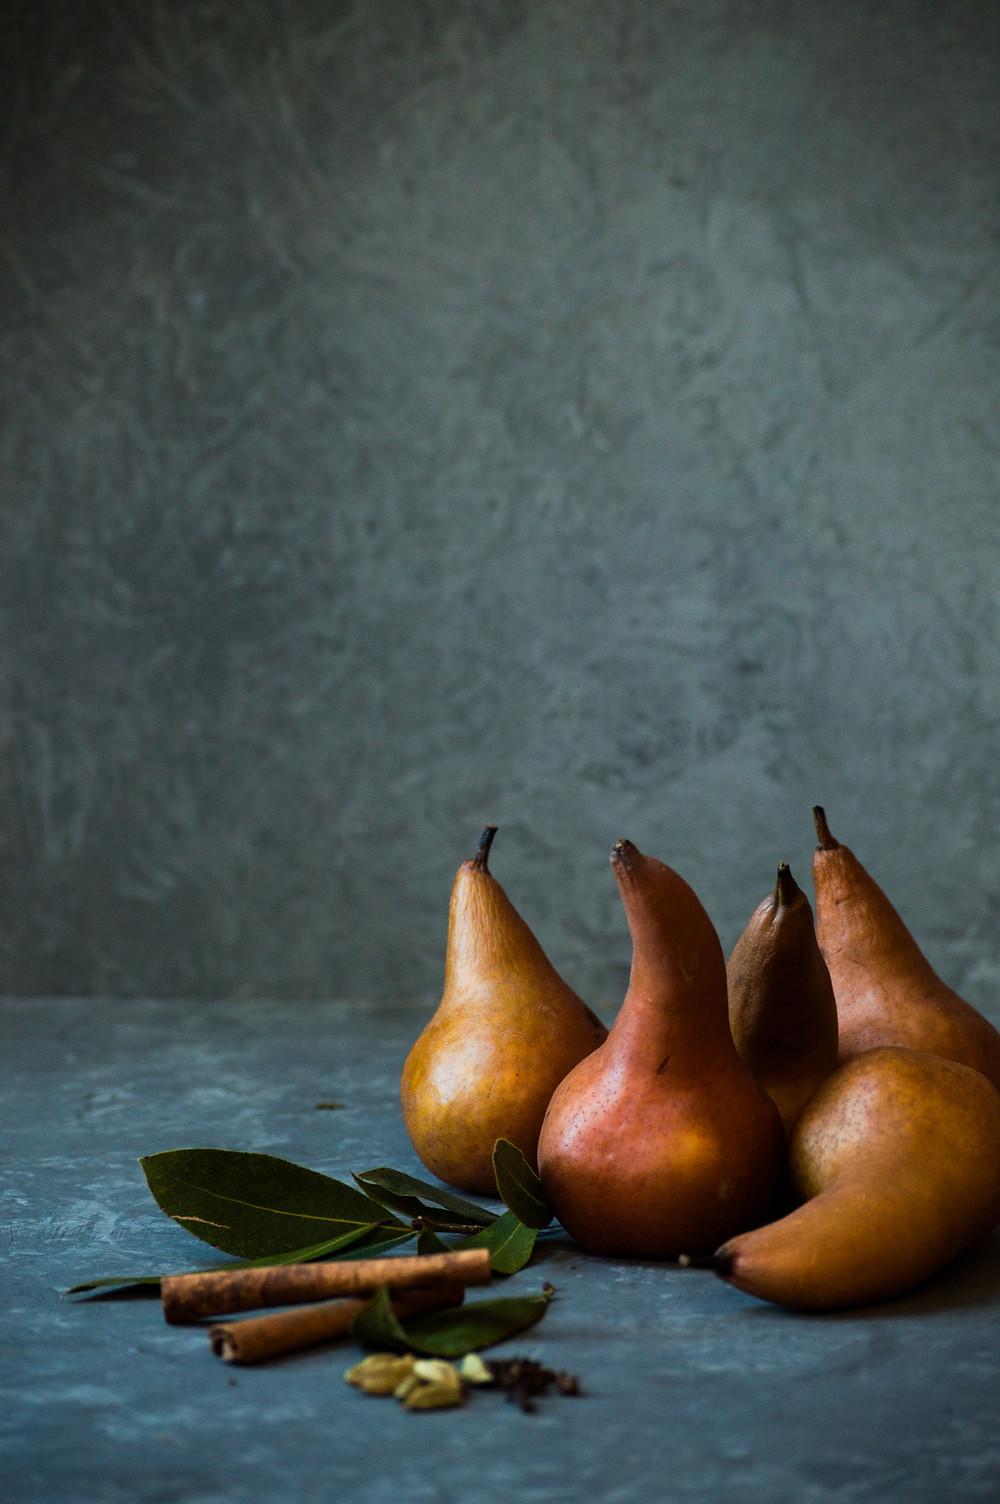 Pears, bay leaf, cinnamon, cardamon, Organic Kitchen Gardens